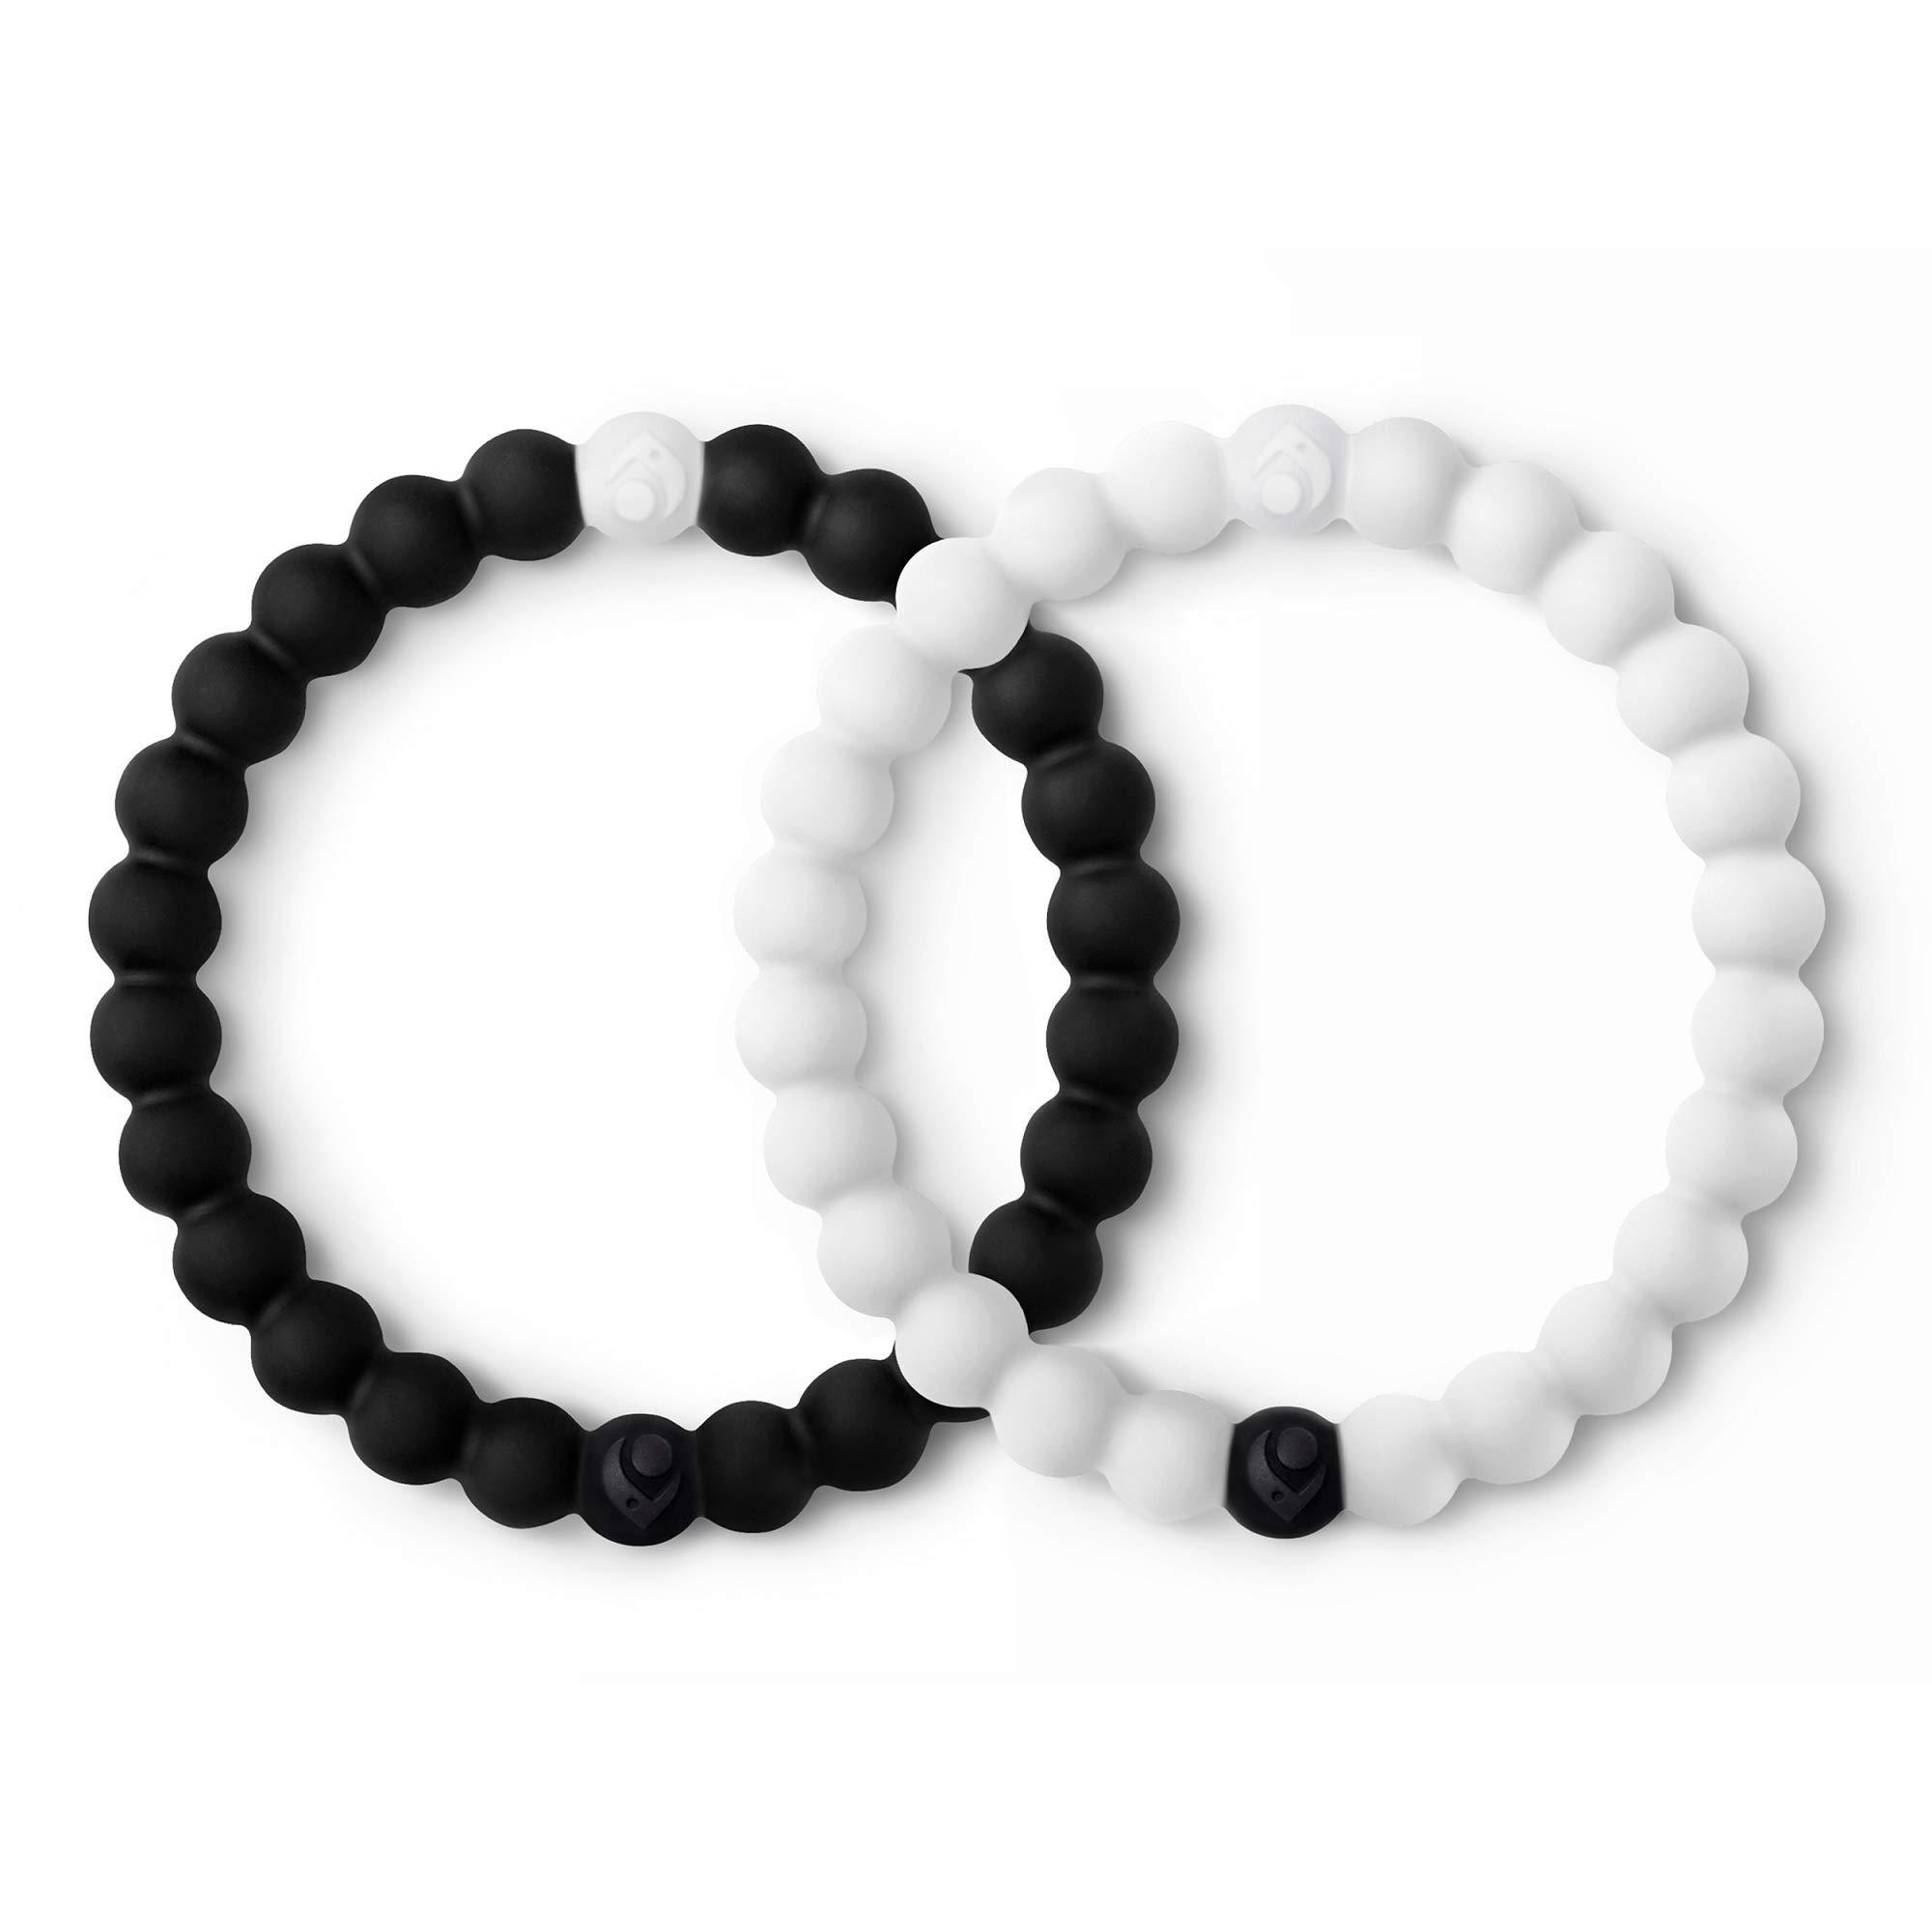 Lokai Black & White Bracelet Set, 6.5'' - Medium by Lokai